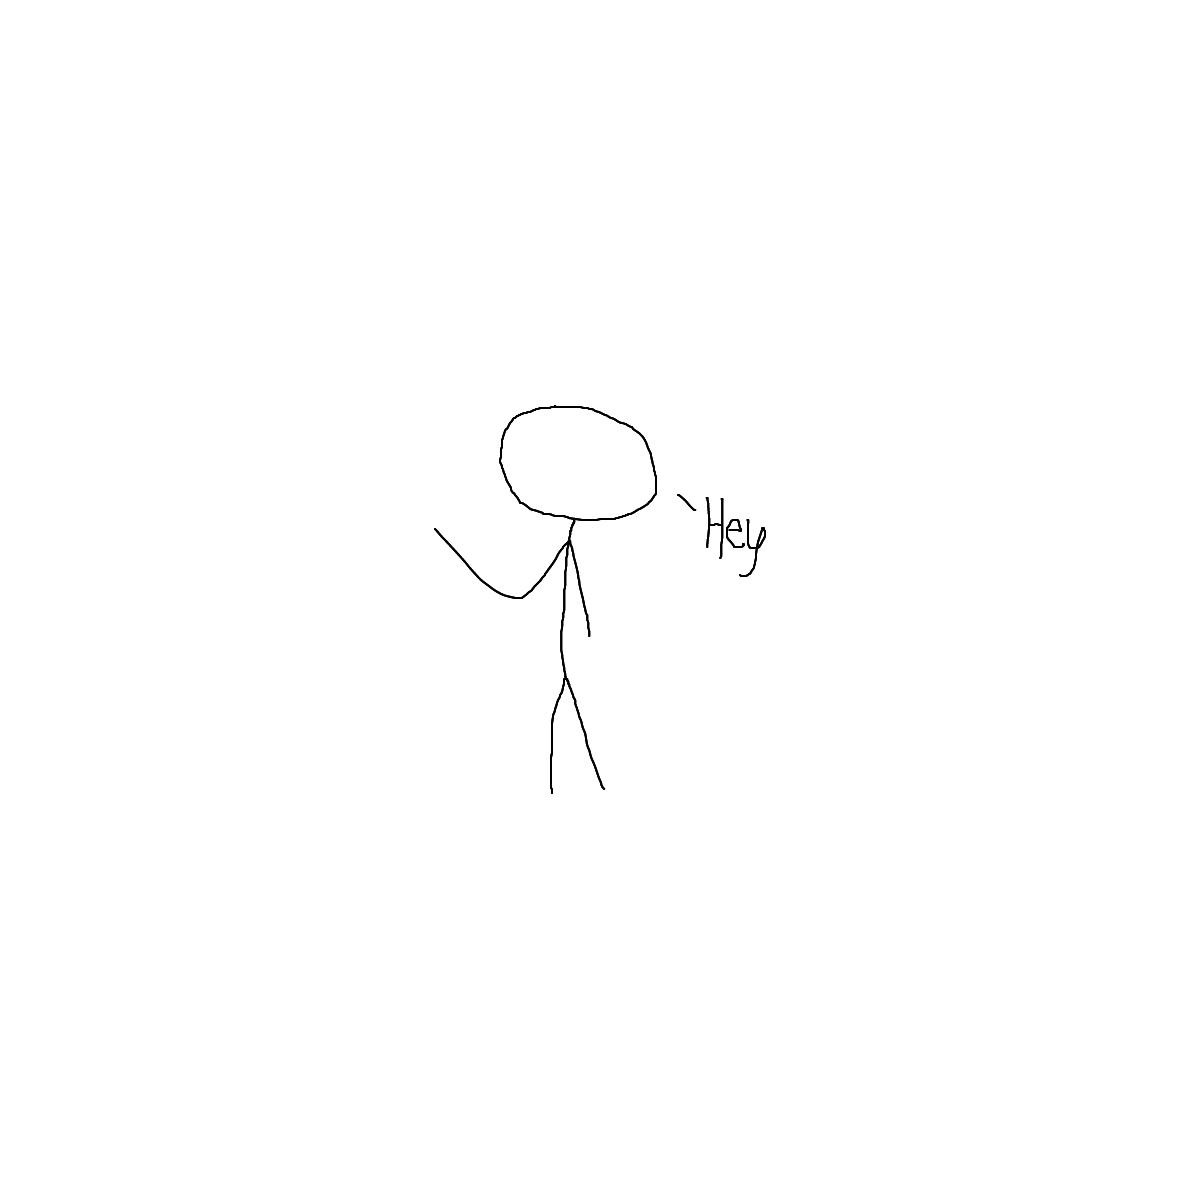 BAAAM drawing#14529 lat:46.4366912841796900lng: -63.6373214721679700